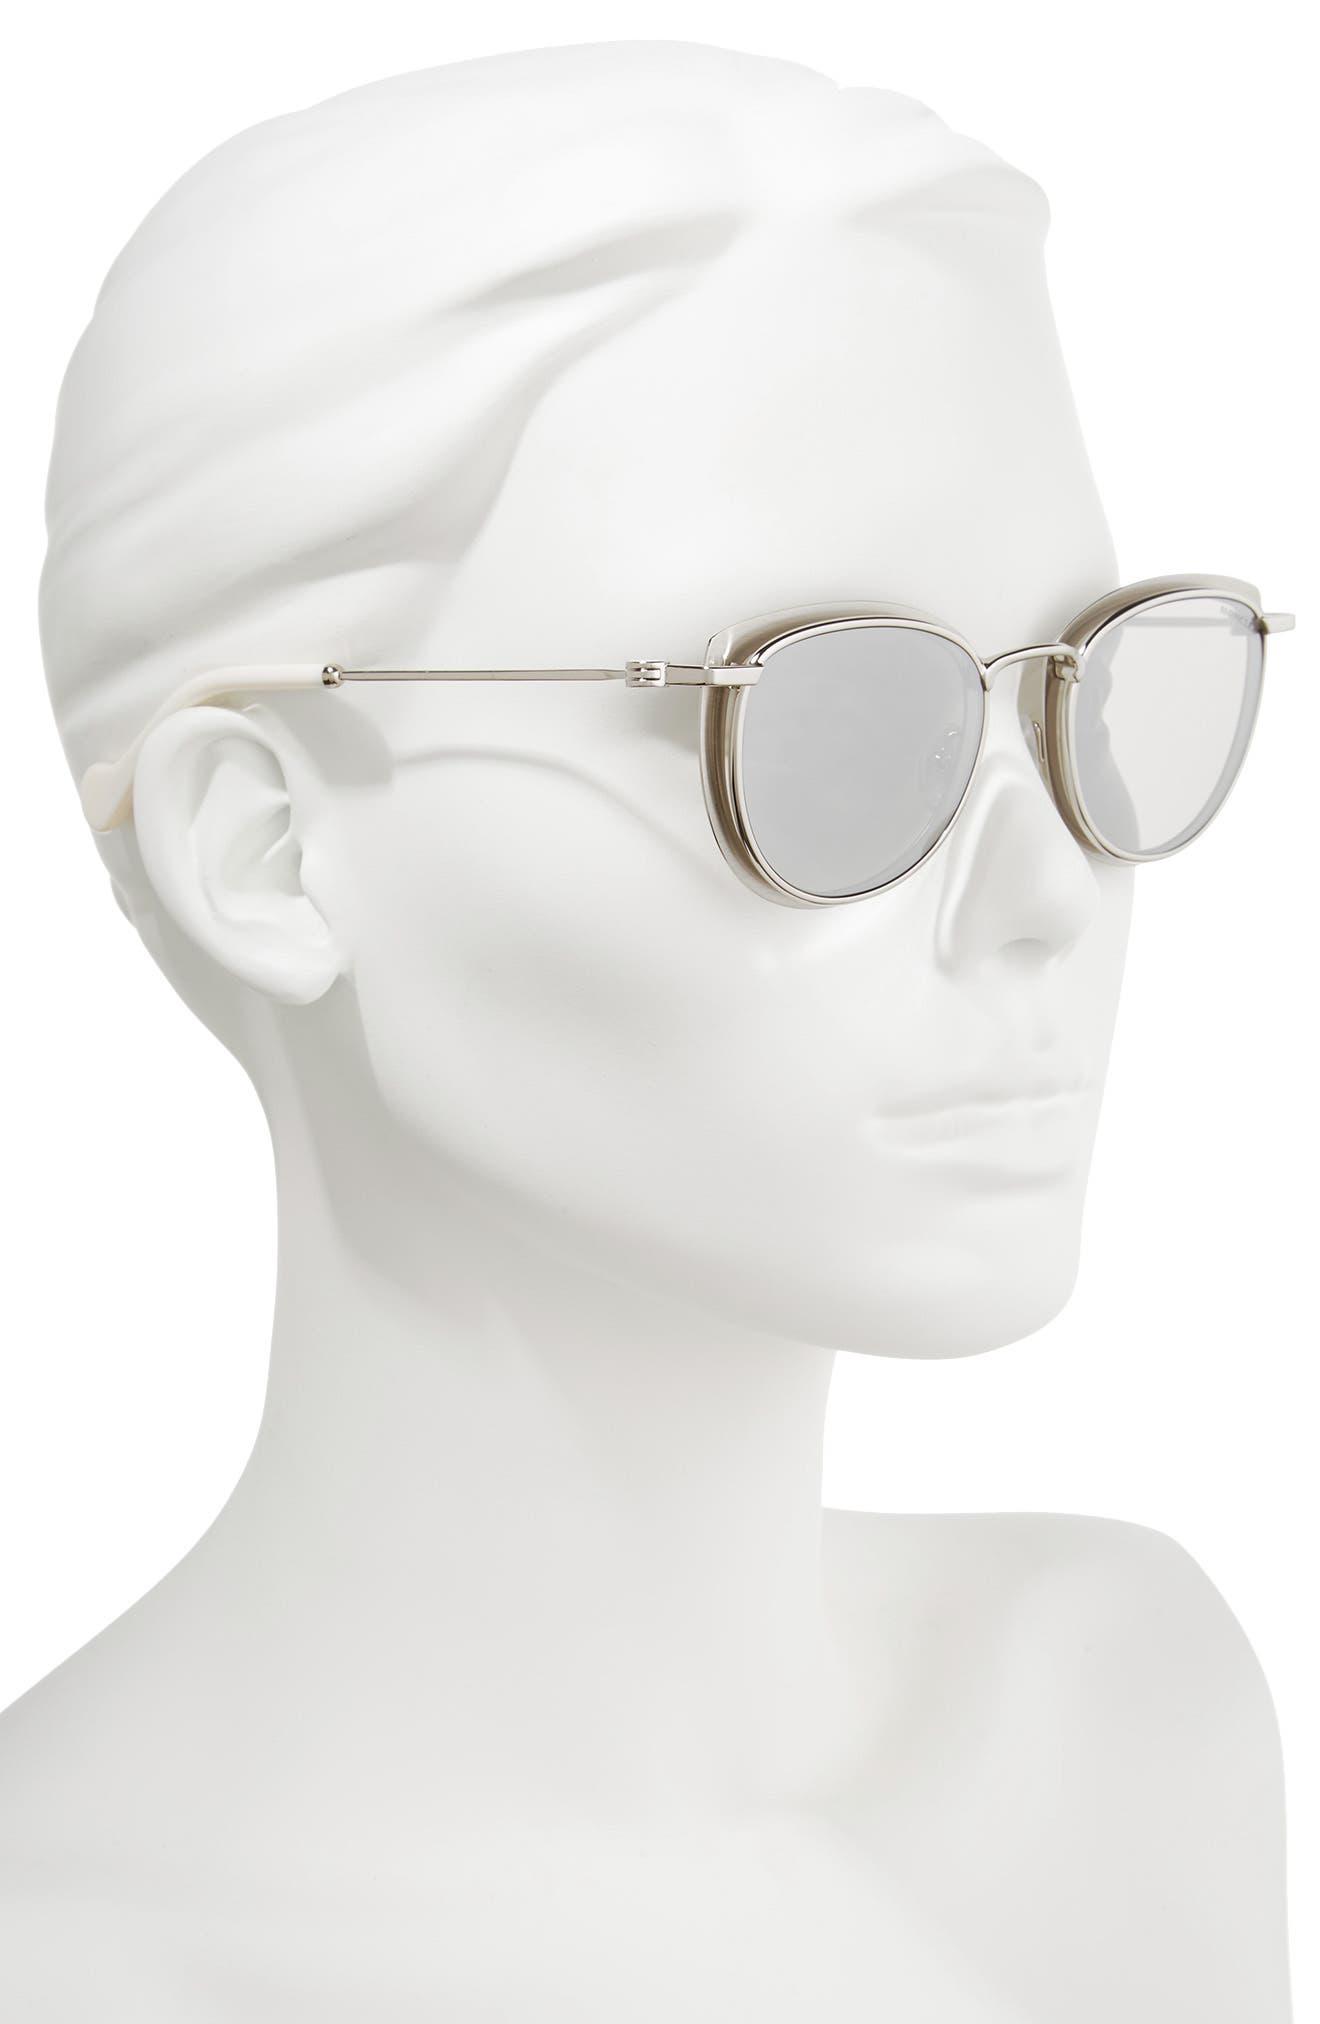 50mm Mirrored Geometric Sunglasses,                             Alternate thumbnail 2, color,                             PALADIUM/ WHITE/ SMOKE/ SILVER